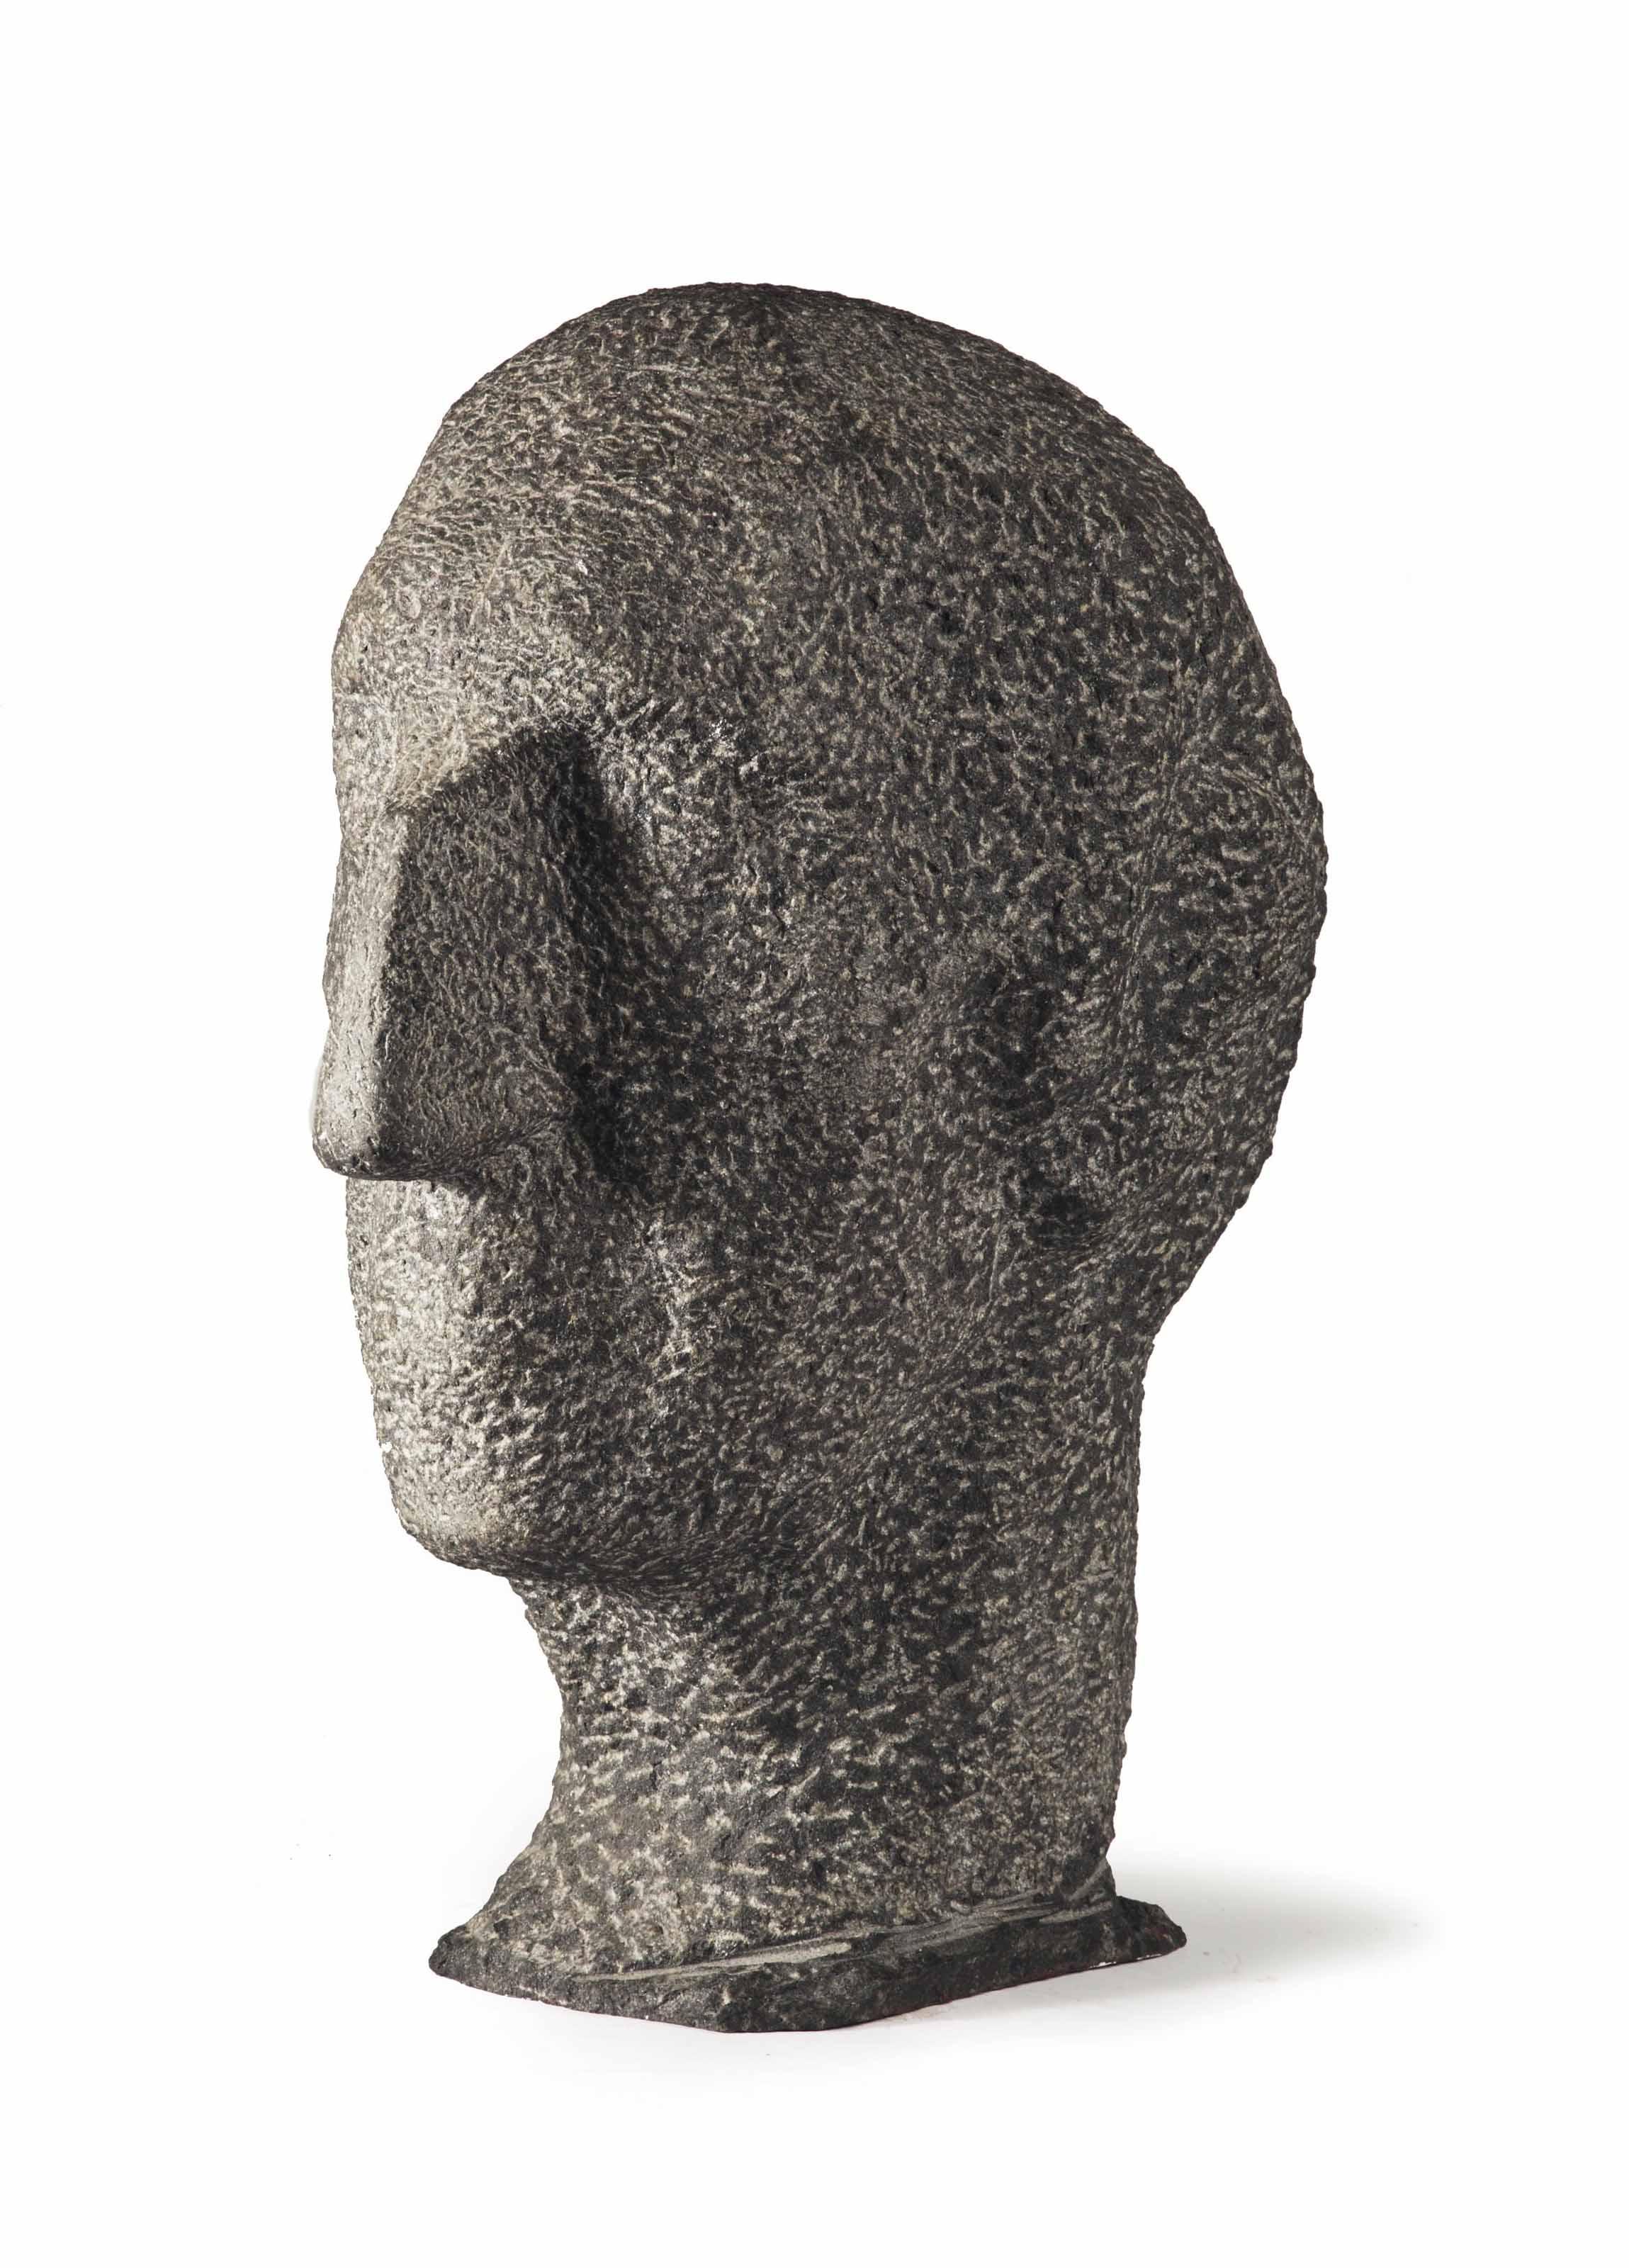 Portrait of the sculptor Albert Termote